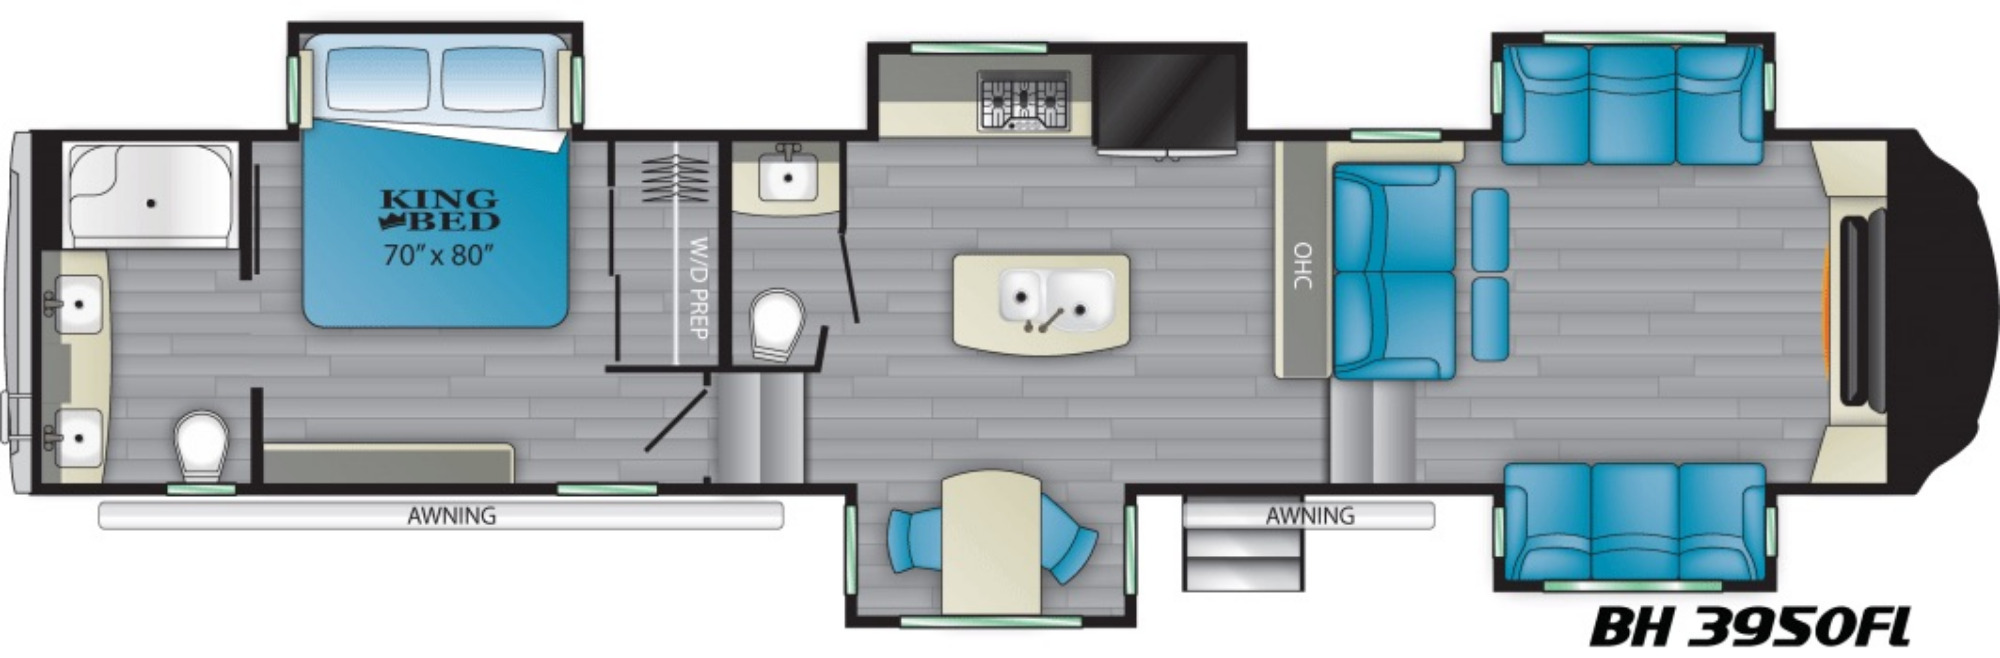 View Floor Plan for 2021 HEARTLAND BIGHORN 3950FL